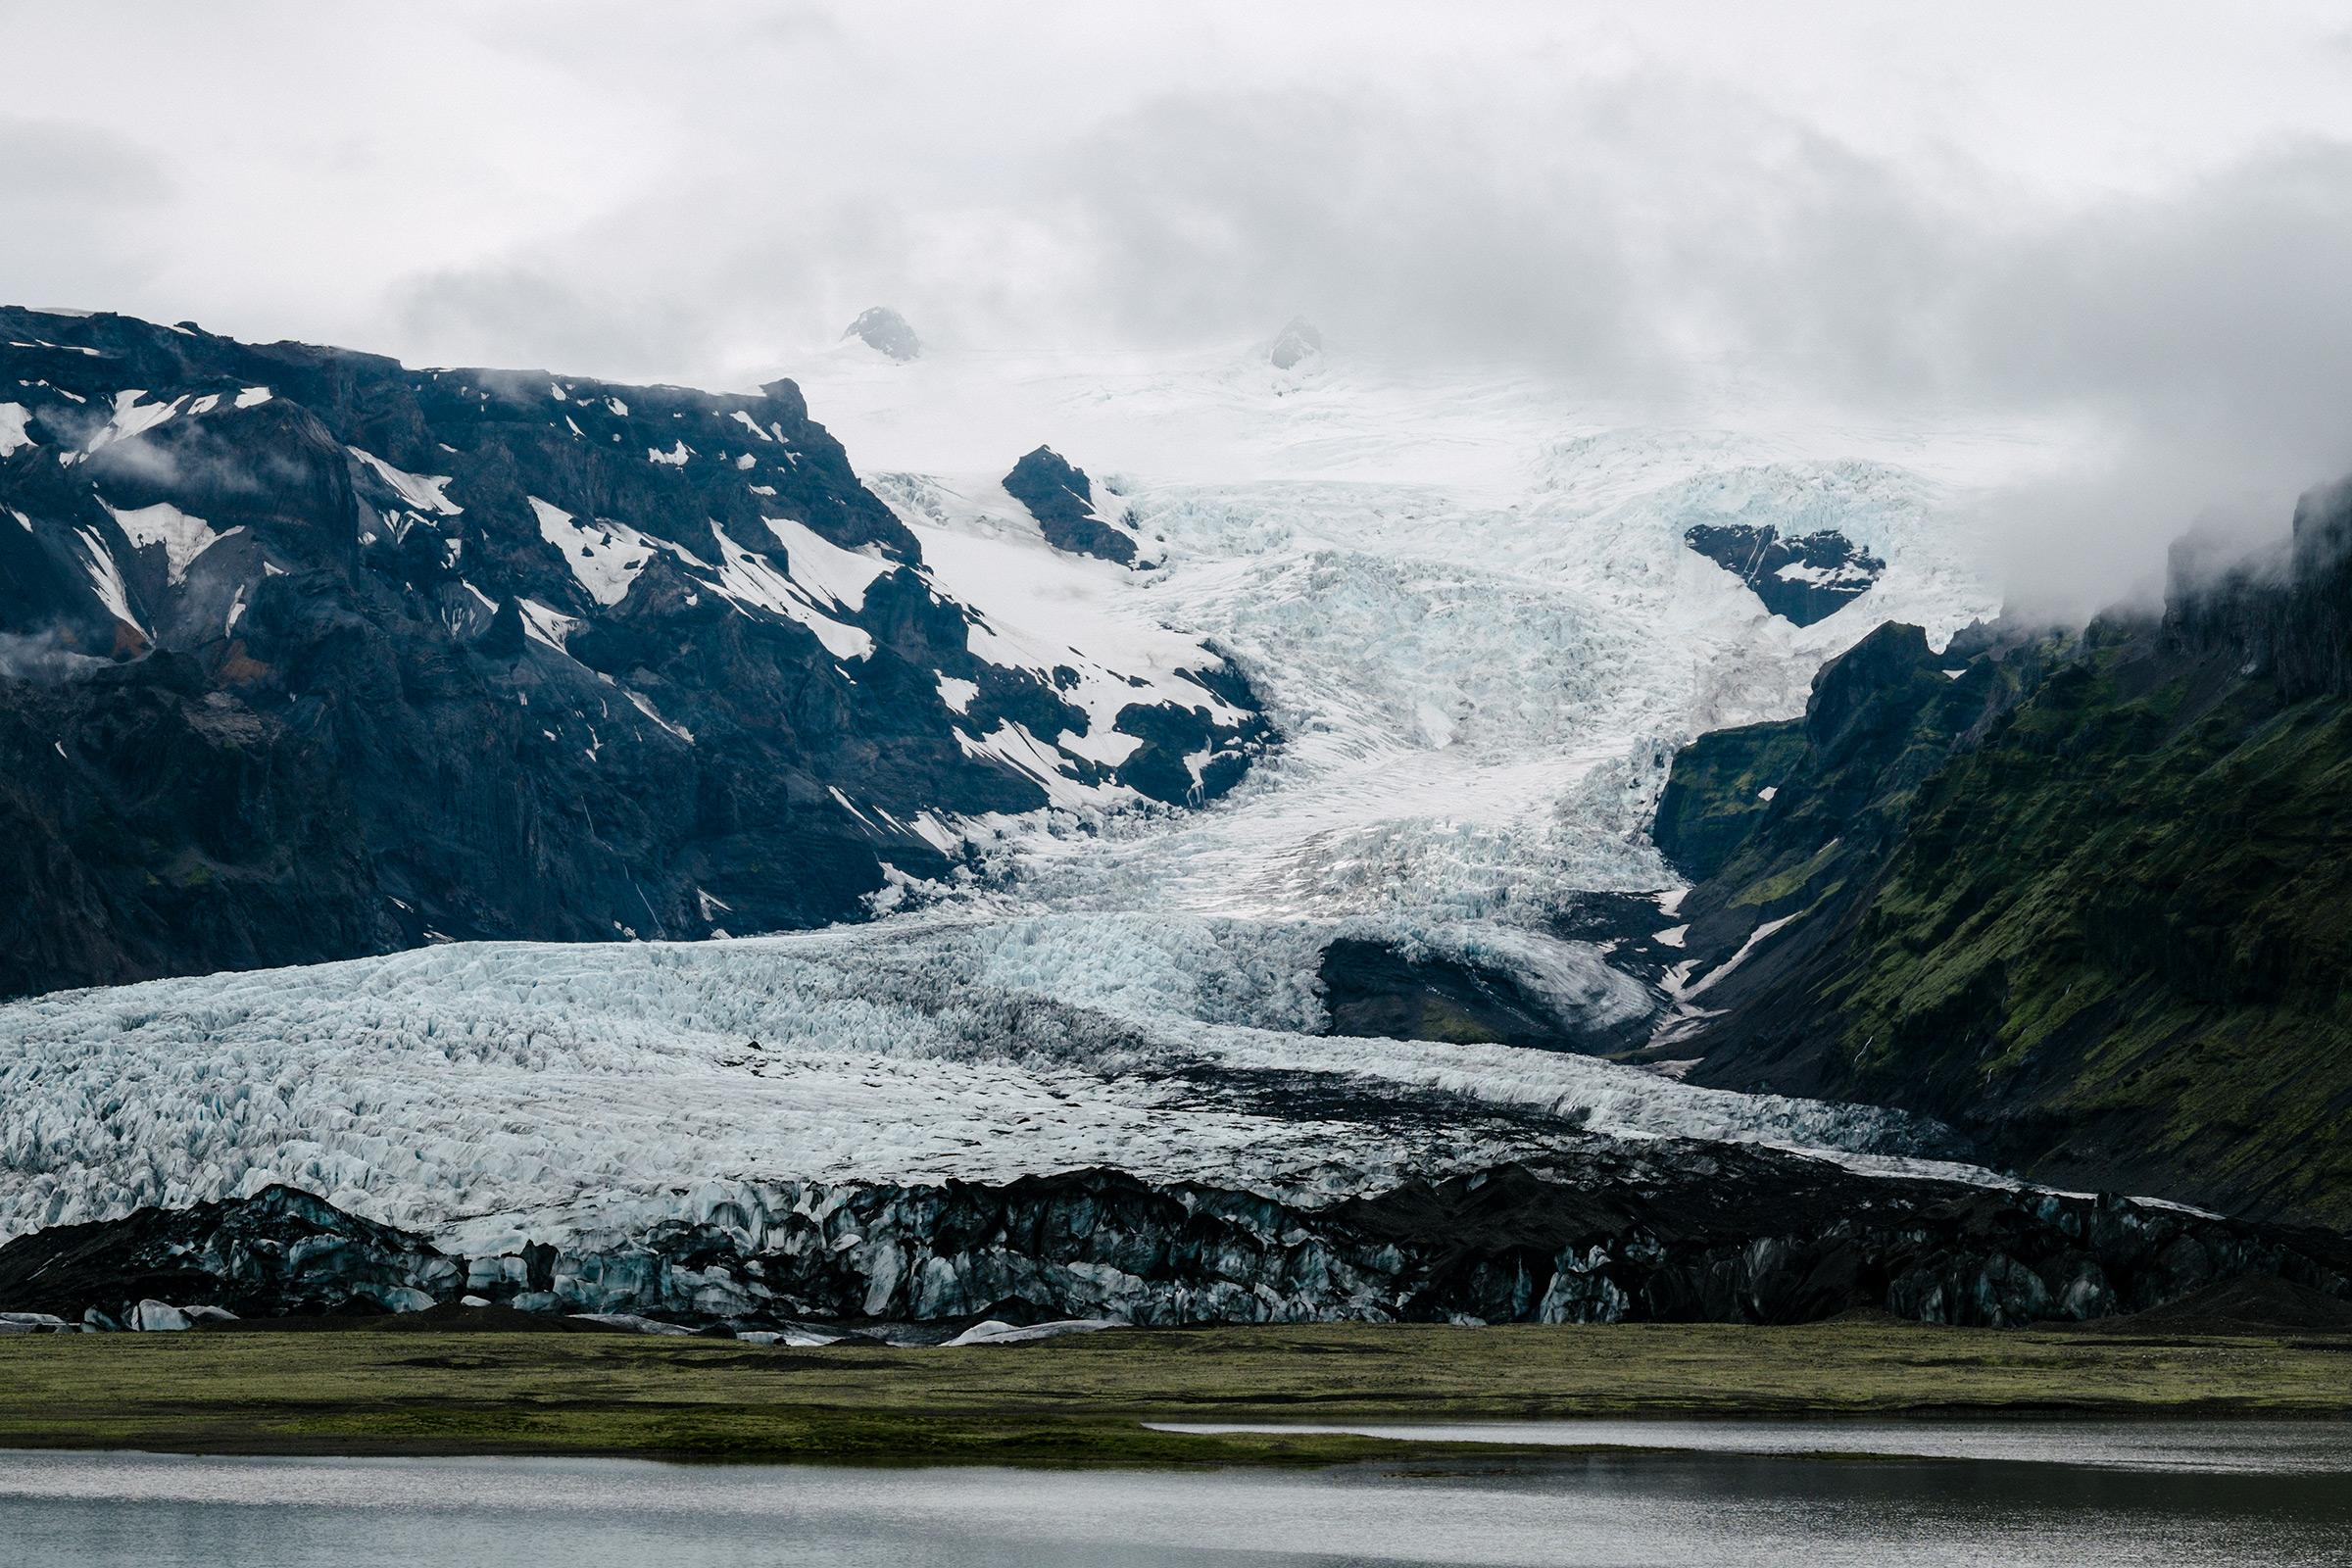 Kviárjökull, Island, Foto: Martin Hülle